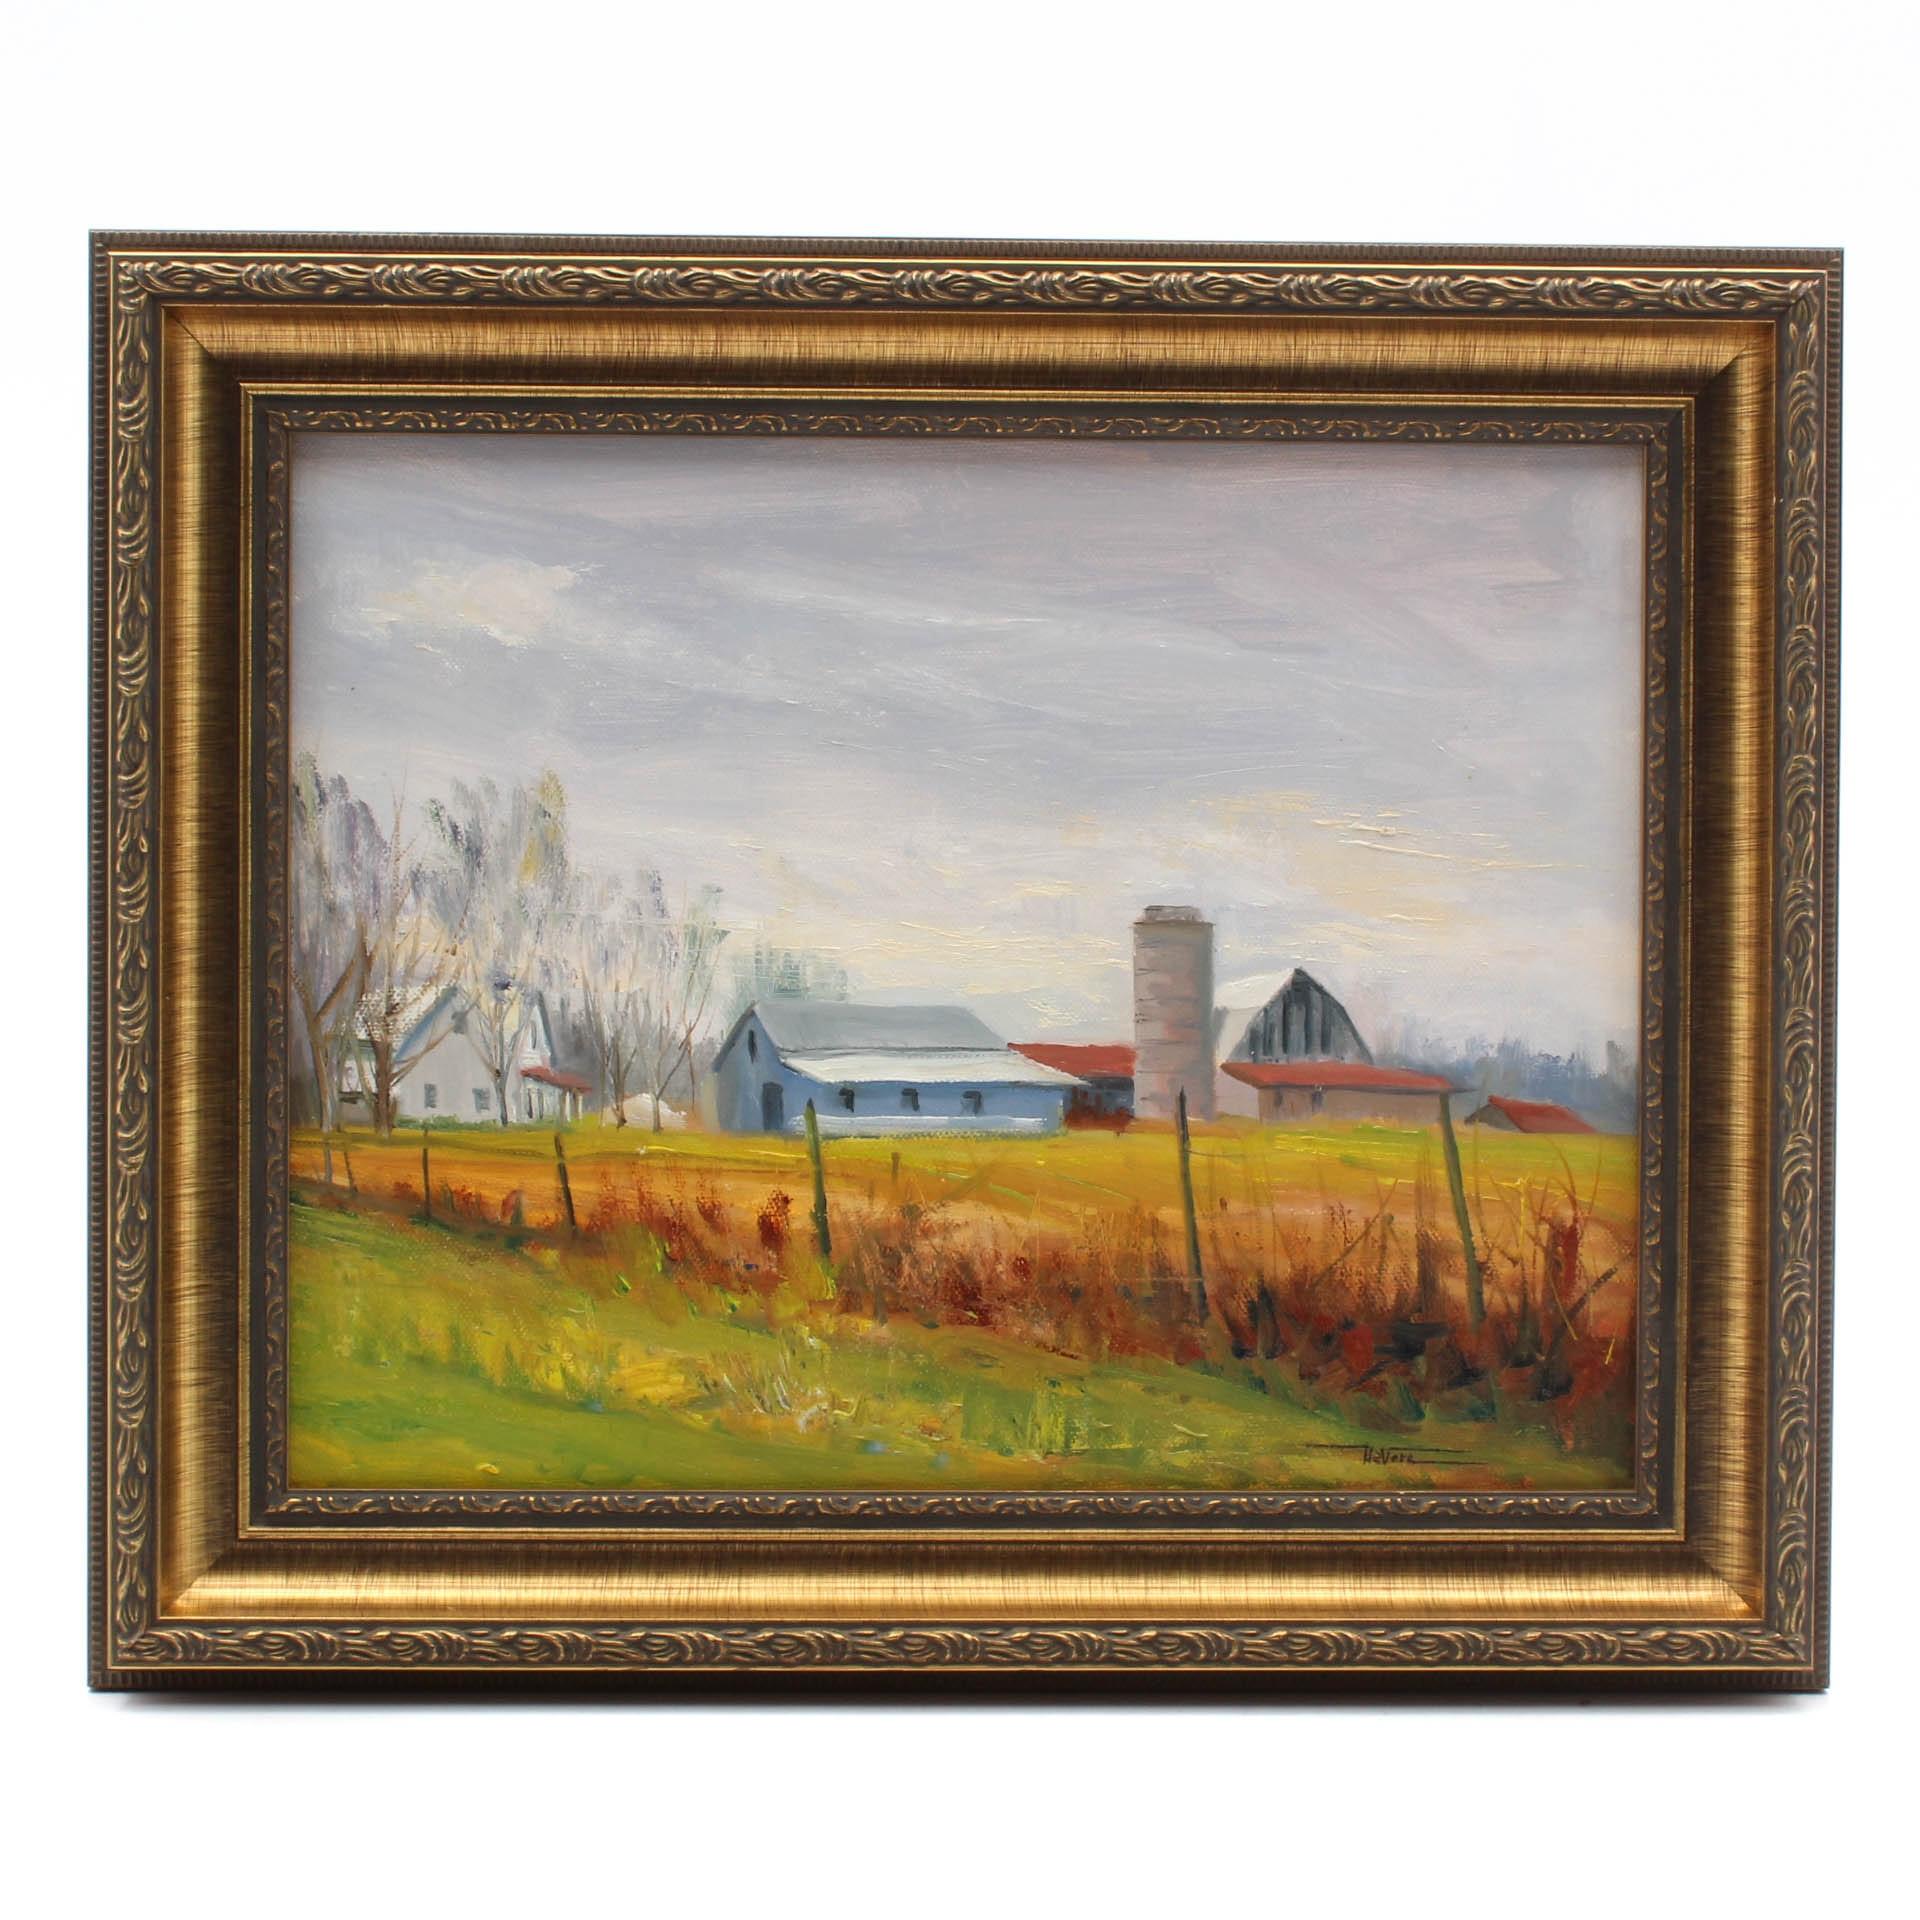 James DeVore Oil Painting